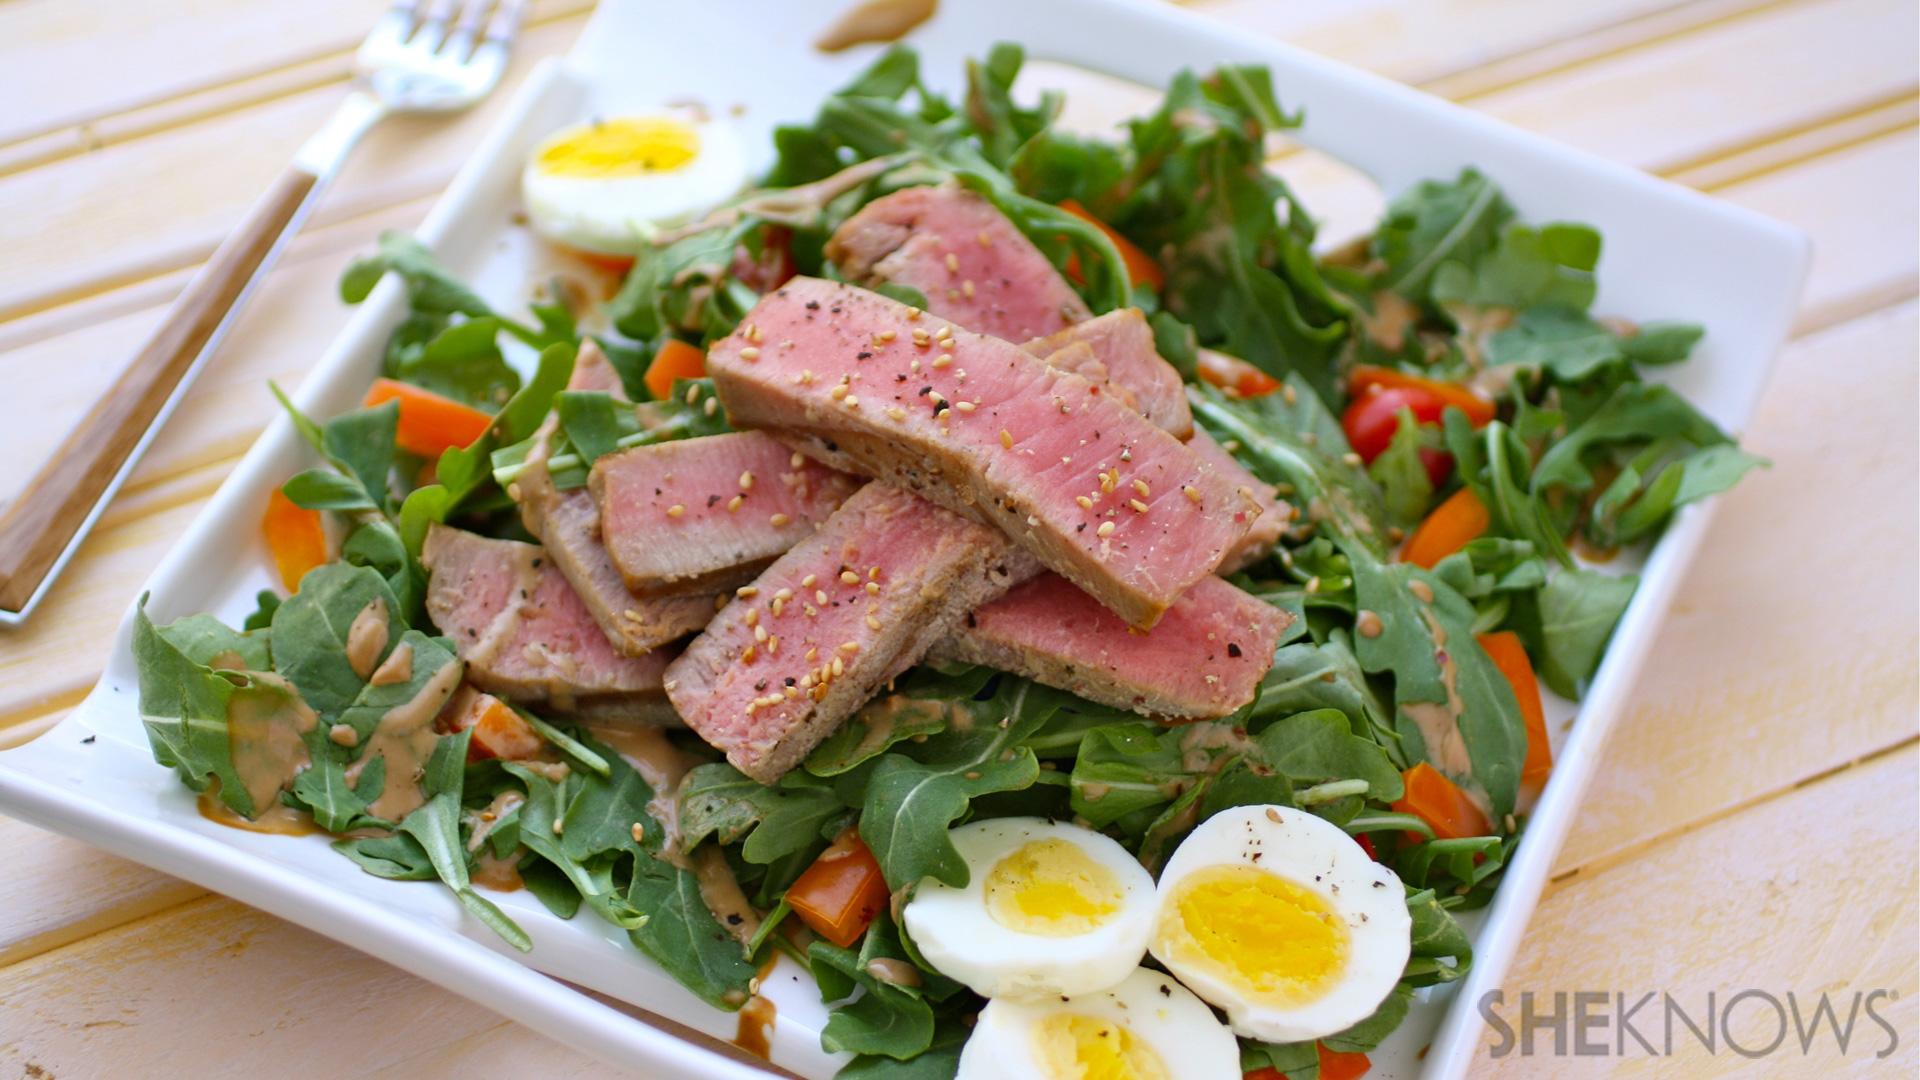 Gluten-free grilled tuna salad with creamy sesame-garlic dressing recipe